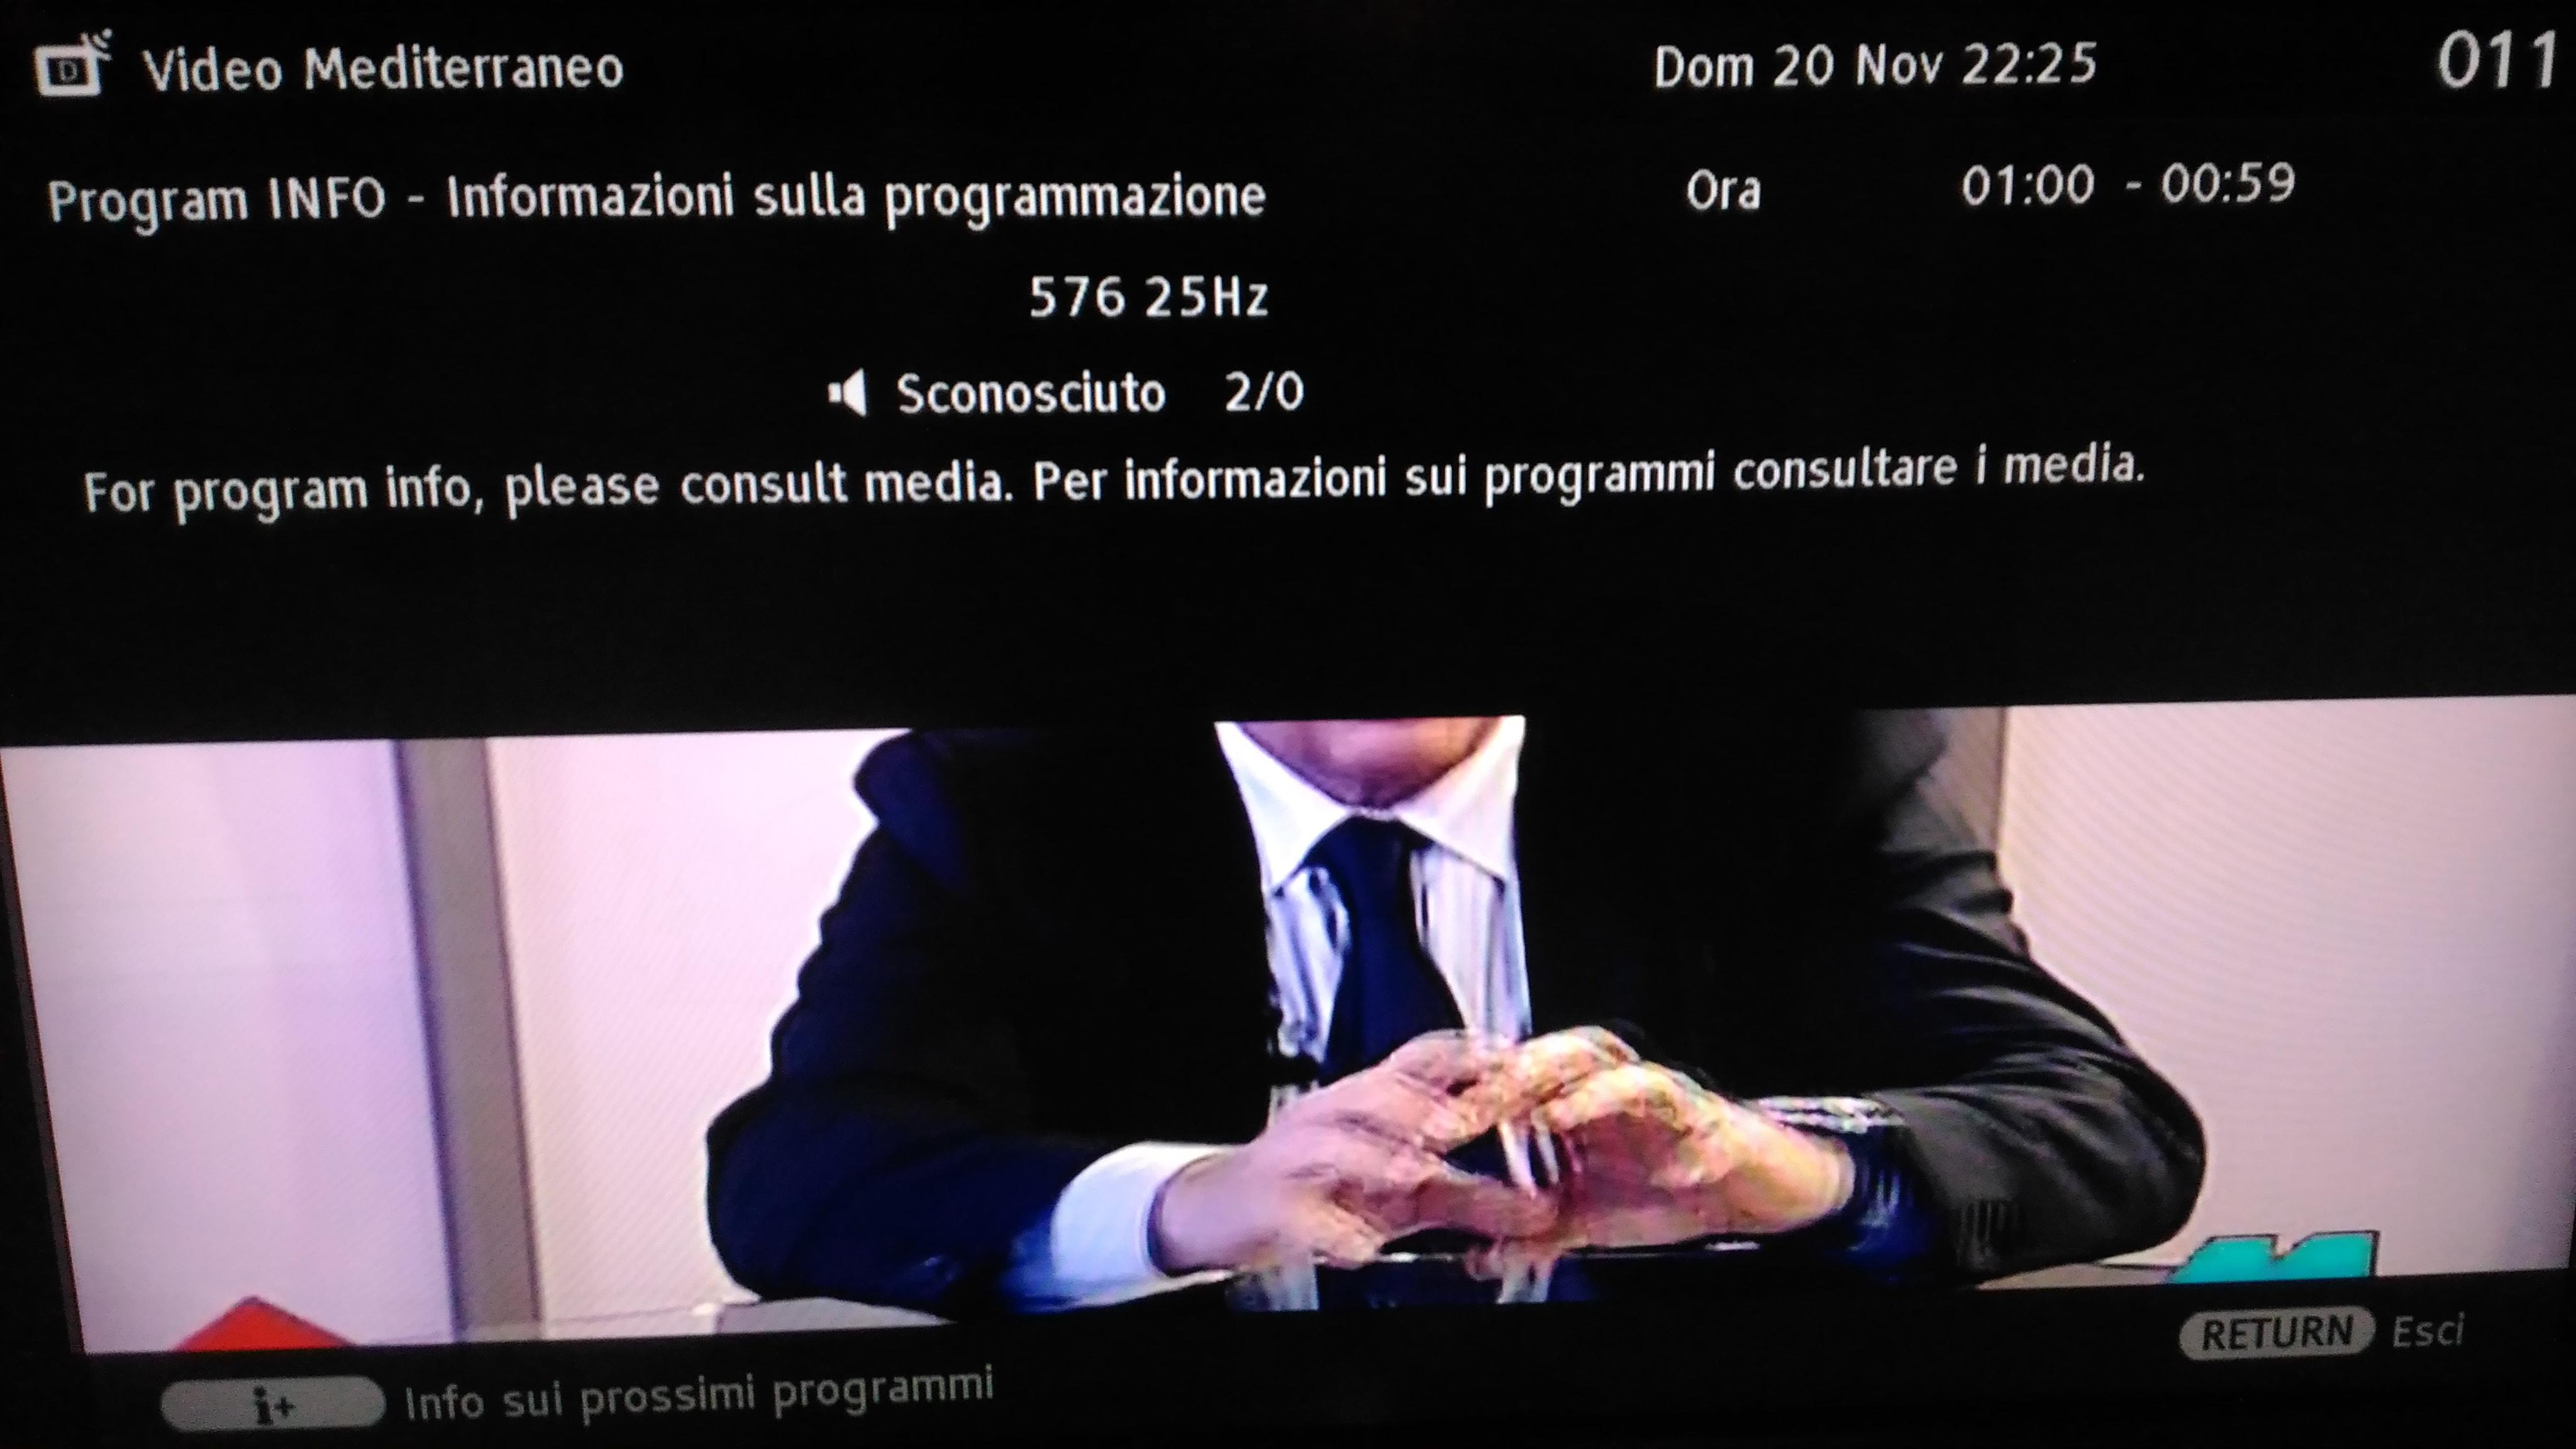 Program Info – Test di EPG sui canali di Videomediterraneo